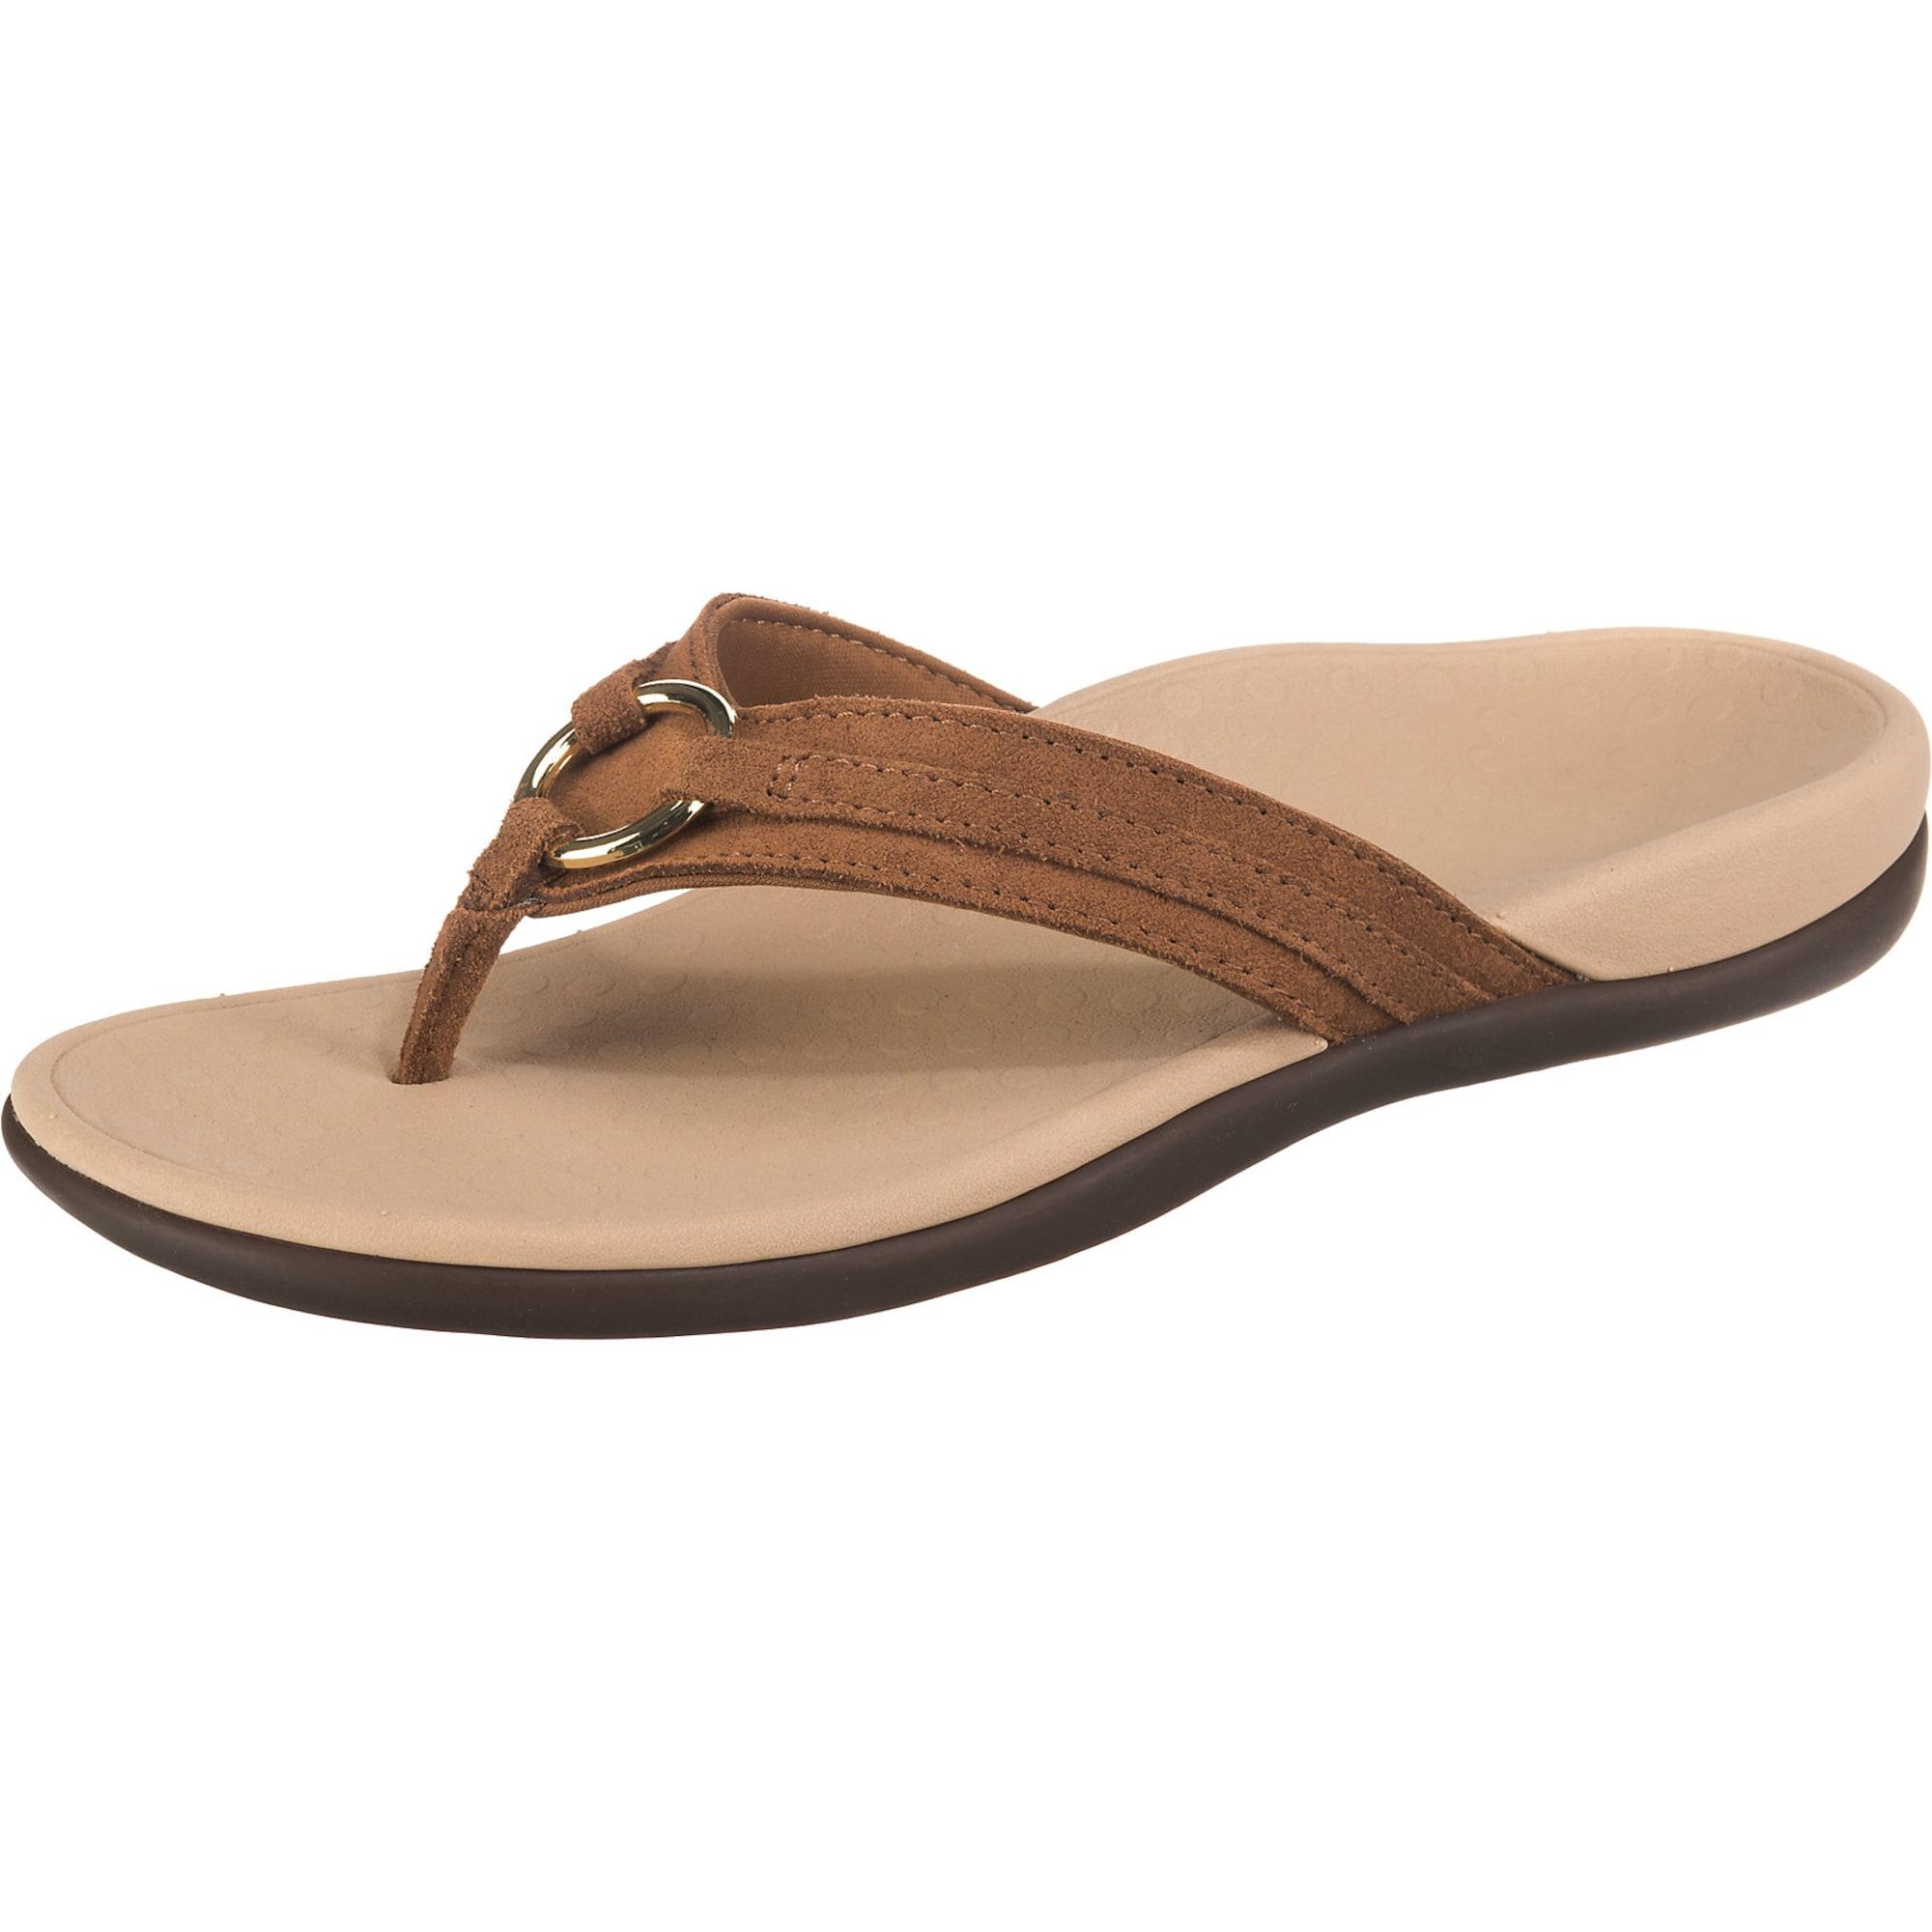 Zehentrenner 'Islander Aloe' | Schuhe > Sandalen & Zehentrenner > Zehentrenner | Vionic